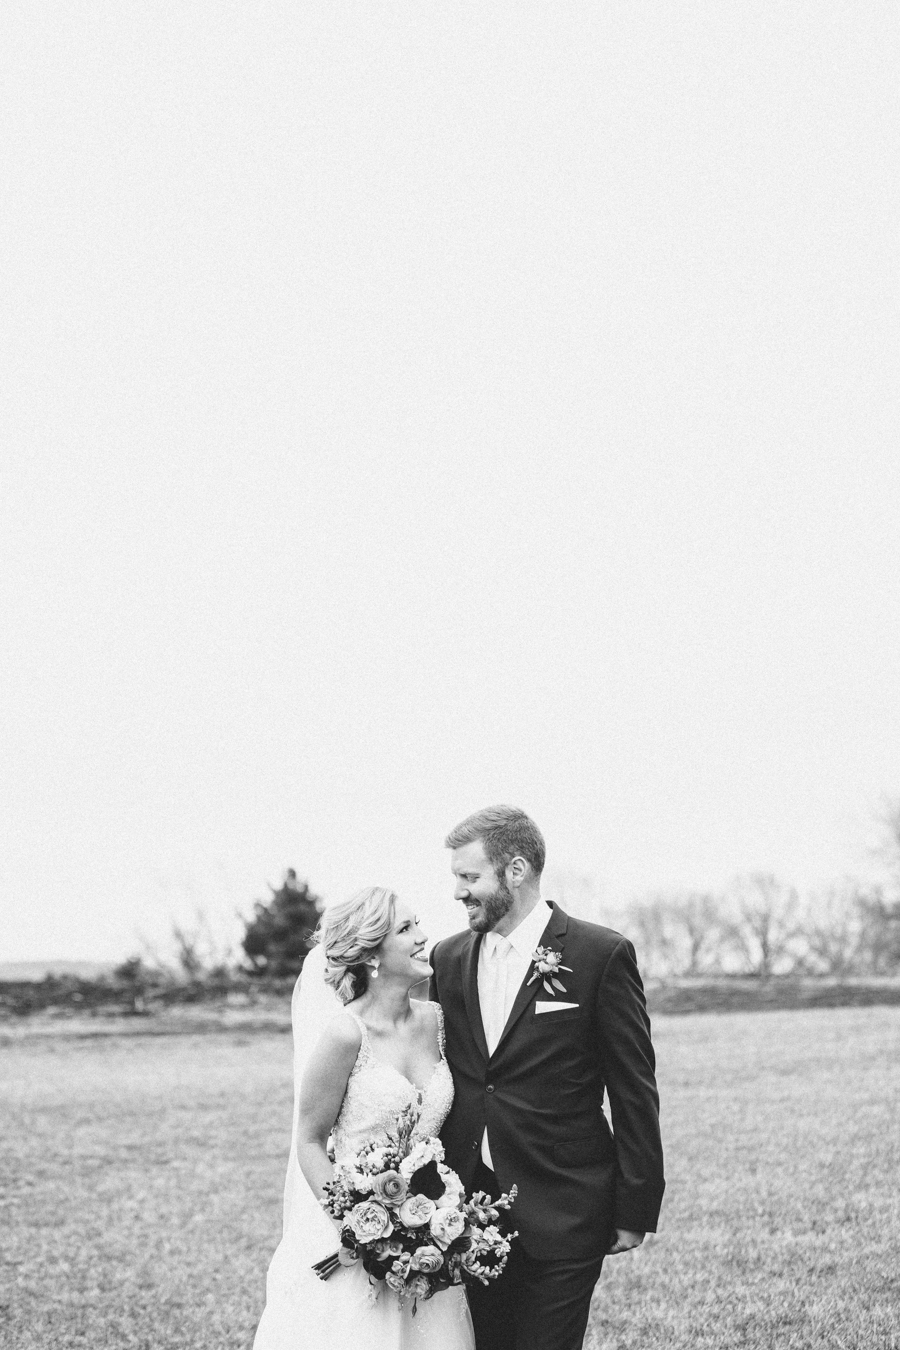 Abiie-ryan-Wedding-blog-1-18.jpg